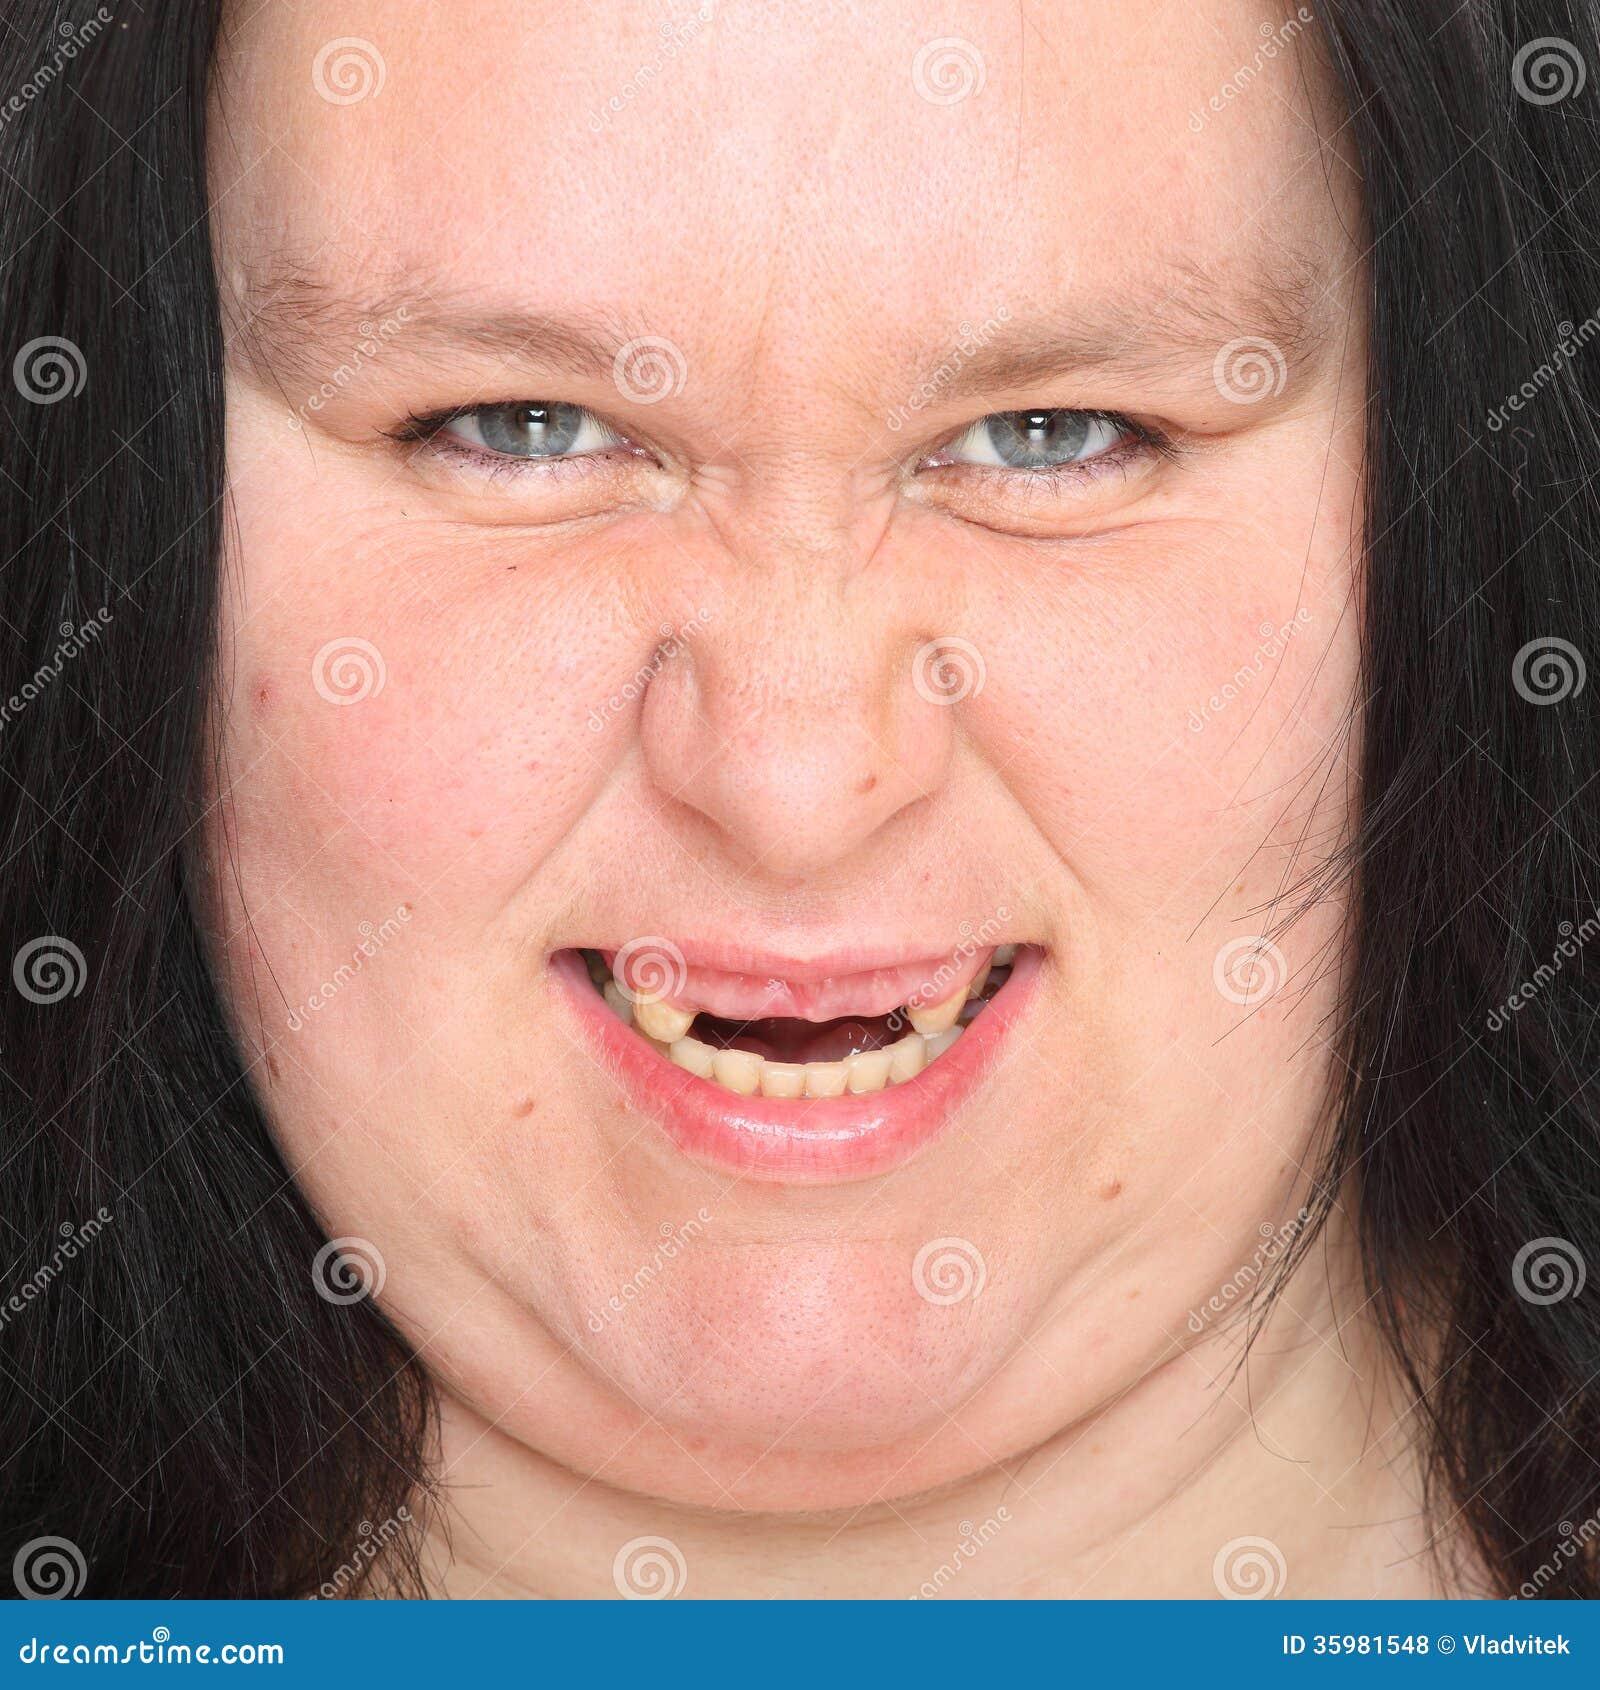 Rotten Teeth Stock Photo Image Of Hygiene, Medical - 35981548-4456